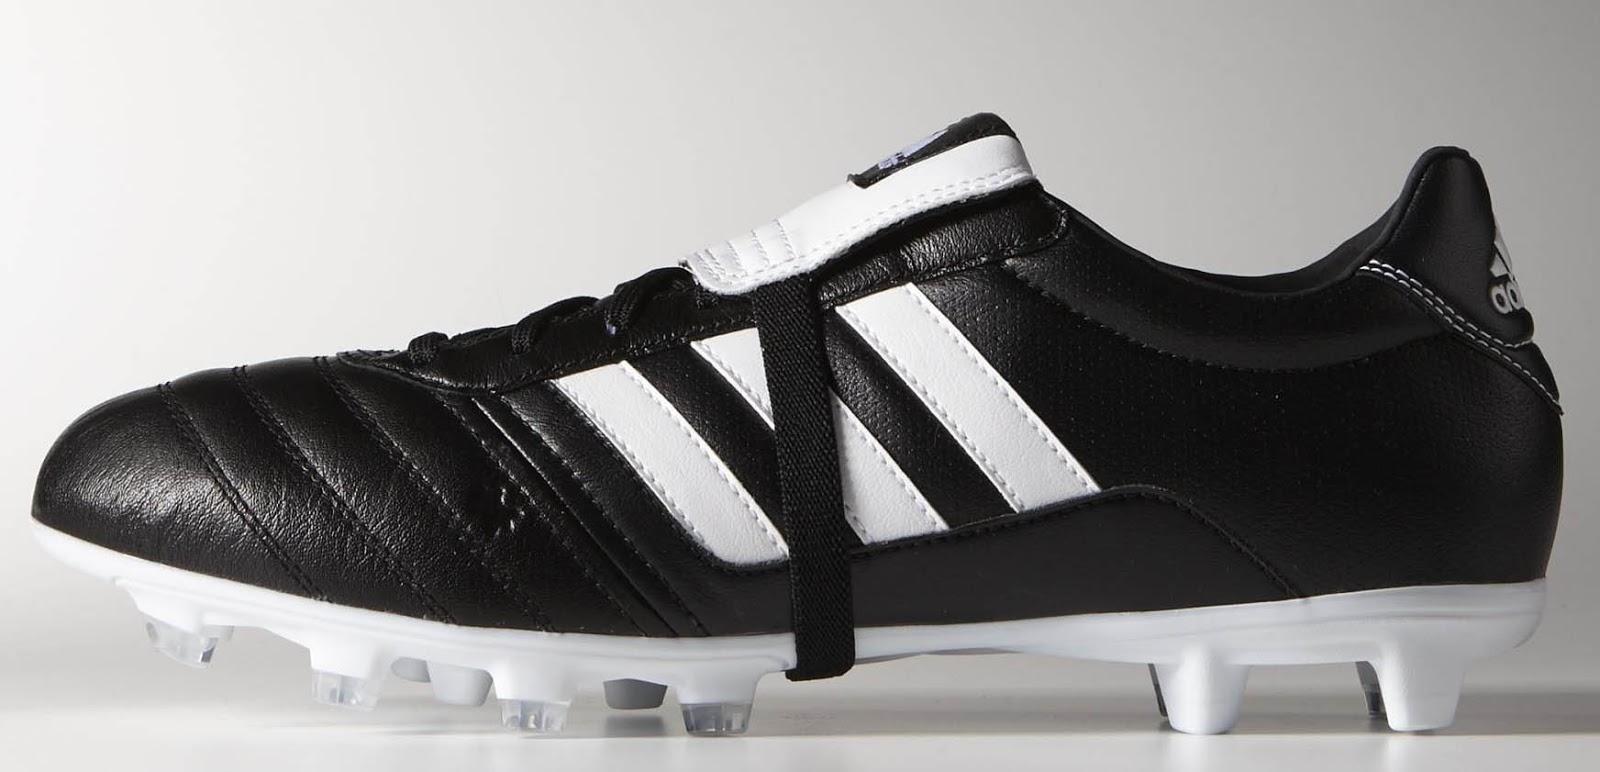 Adidas Gloro Football Boot Released Footy Headlines